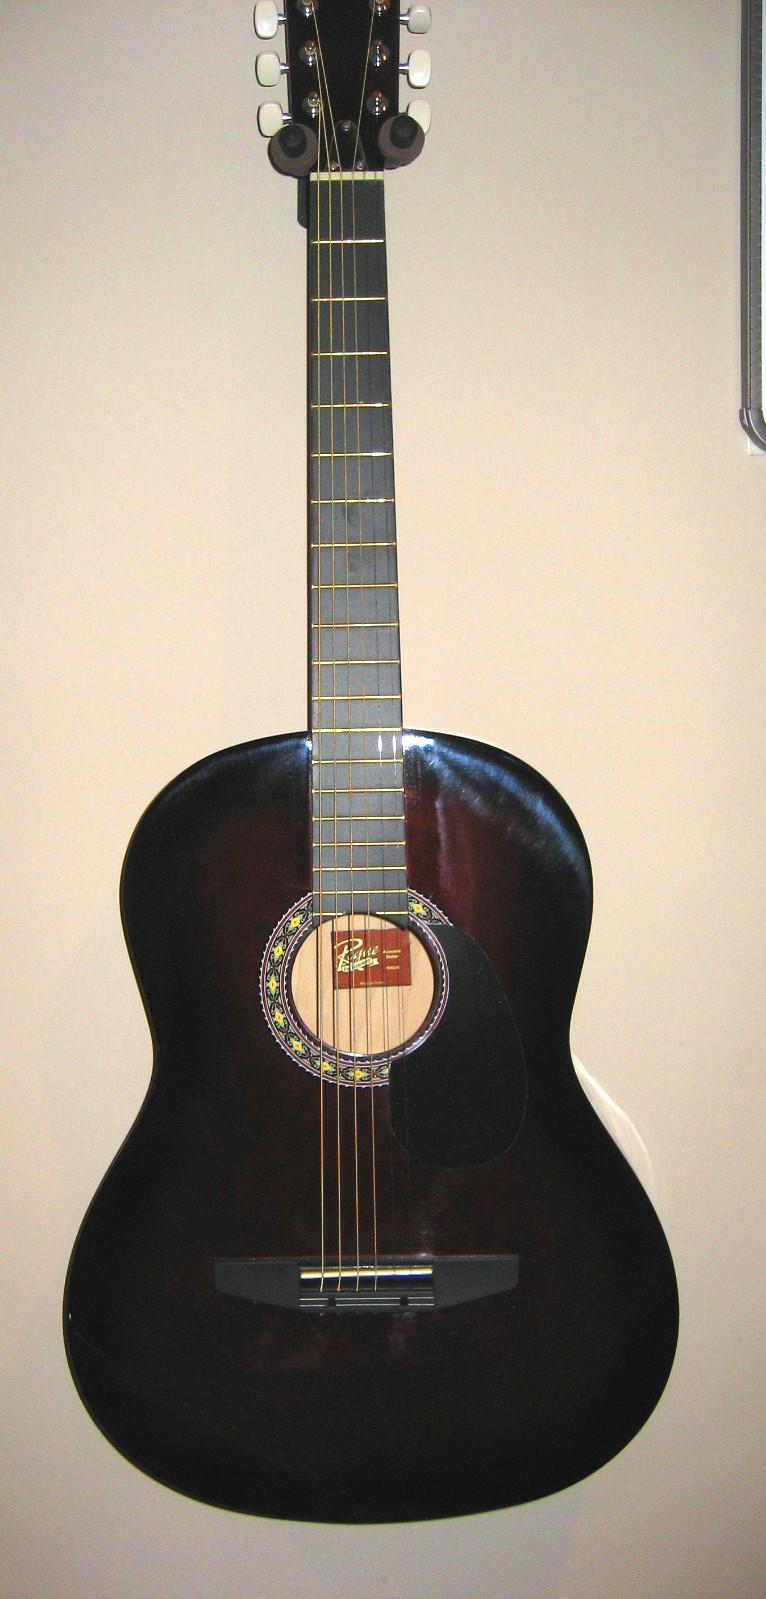 Beginner Guitar Lessons in Lancaster Pa